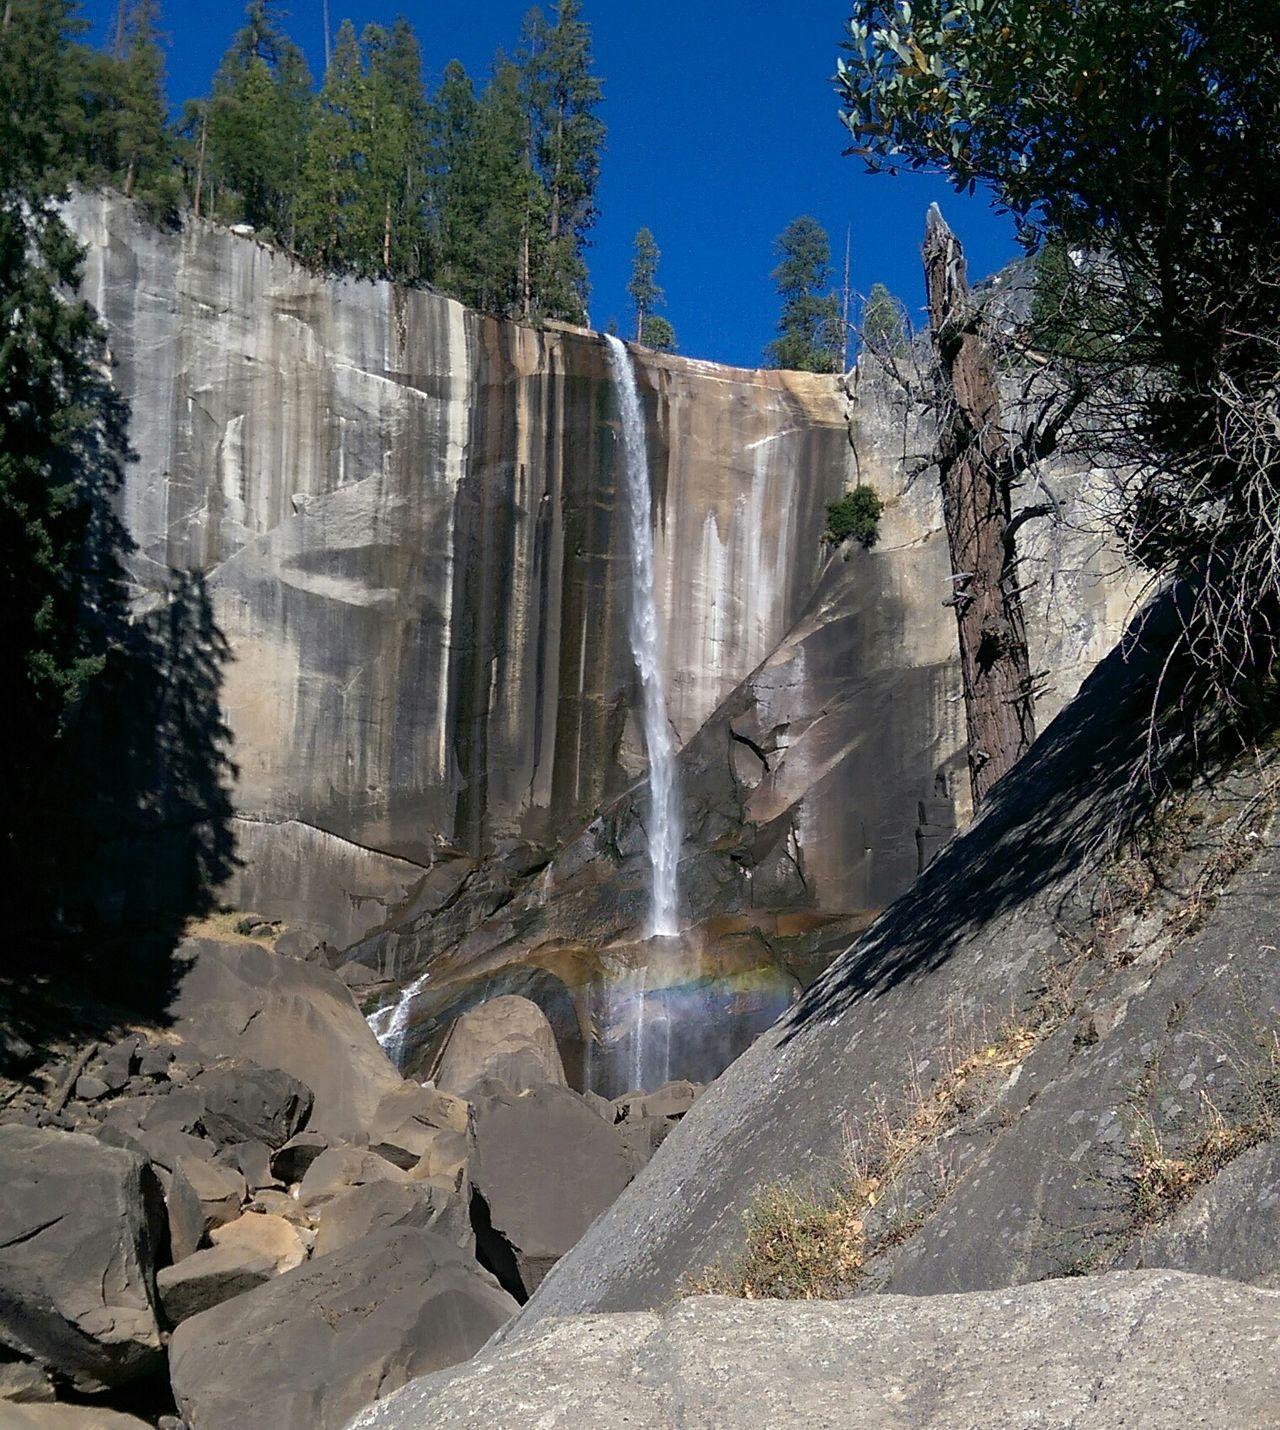 Vernal Fall hiking